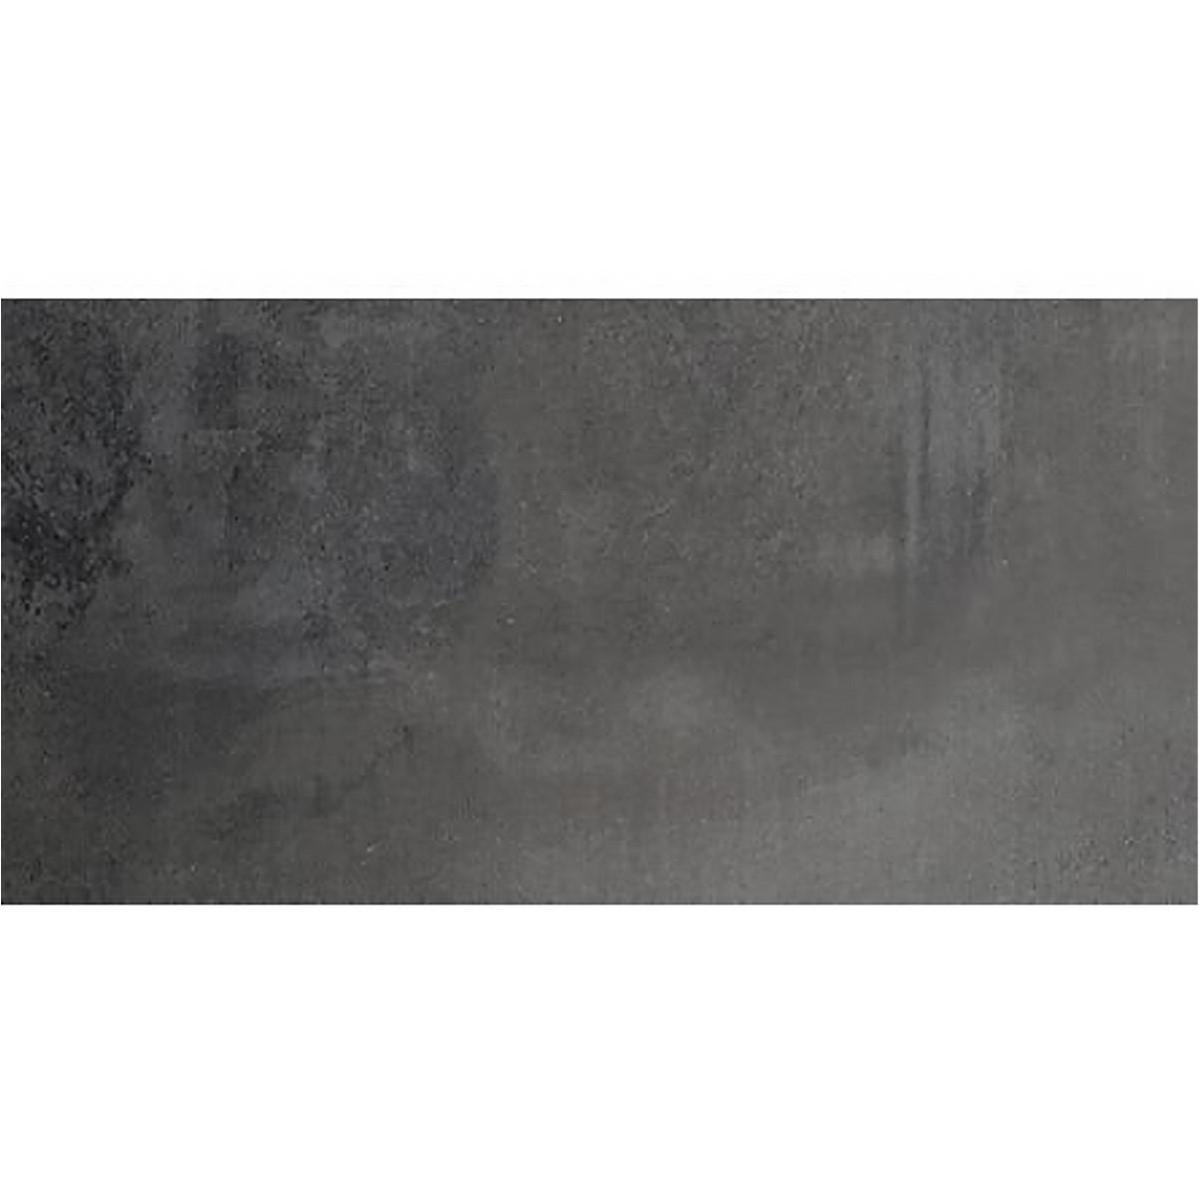 T10196 RAIN GREY